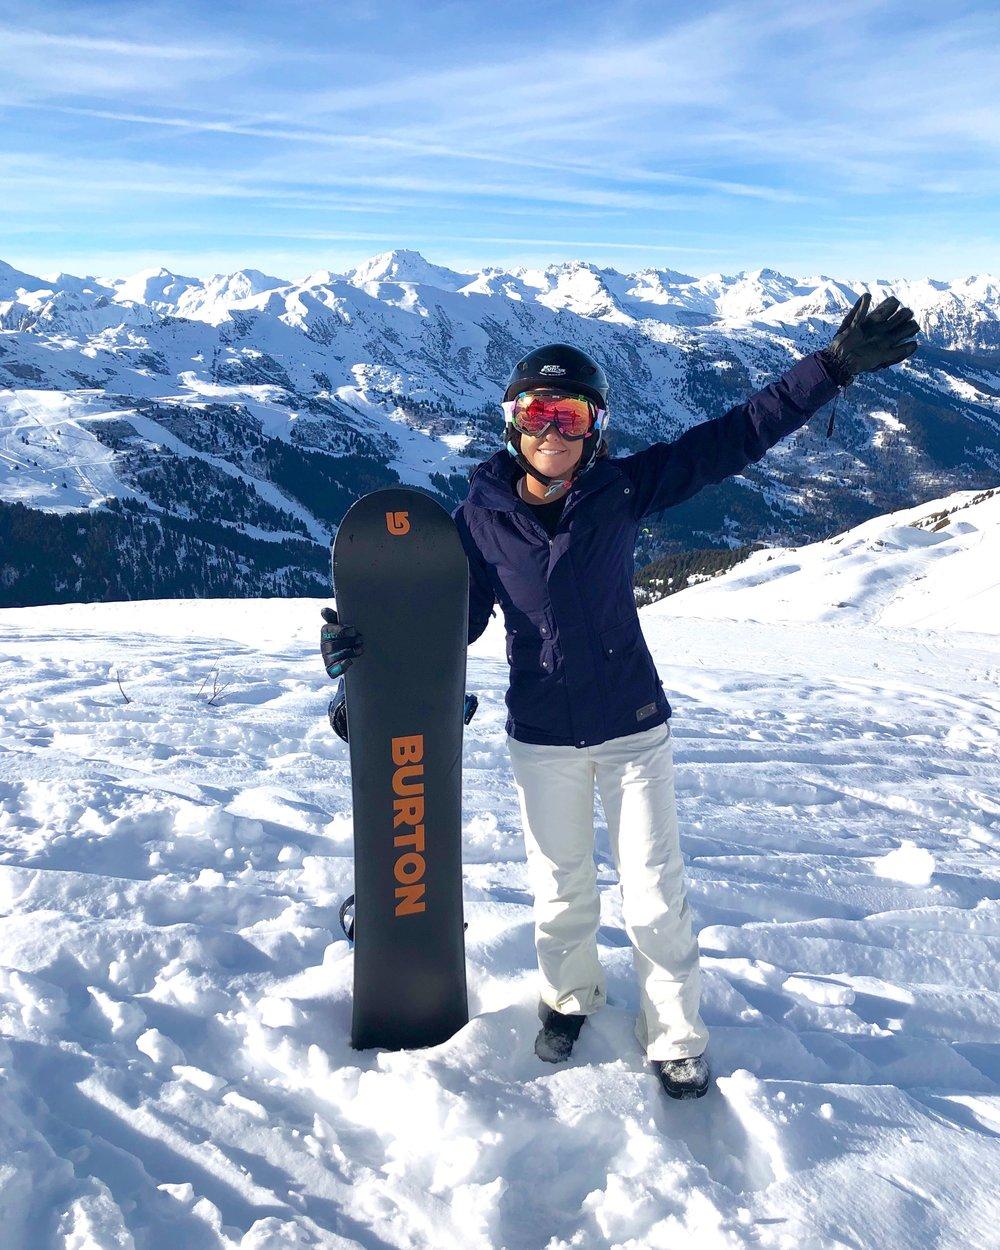 snowboarding-meribel-france